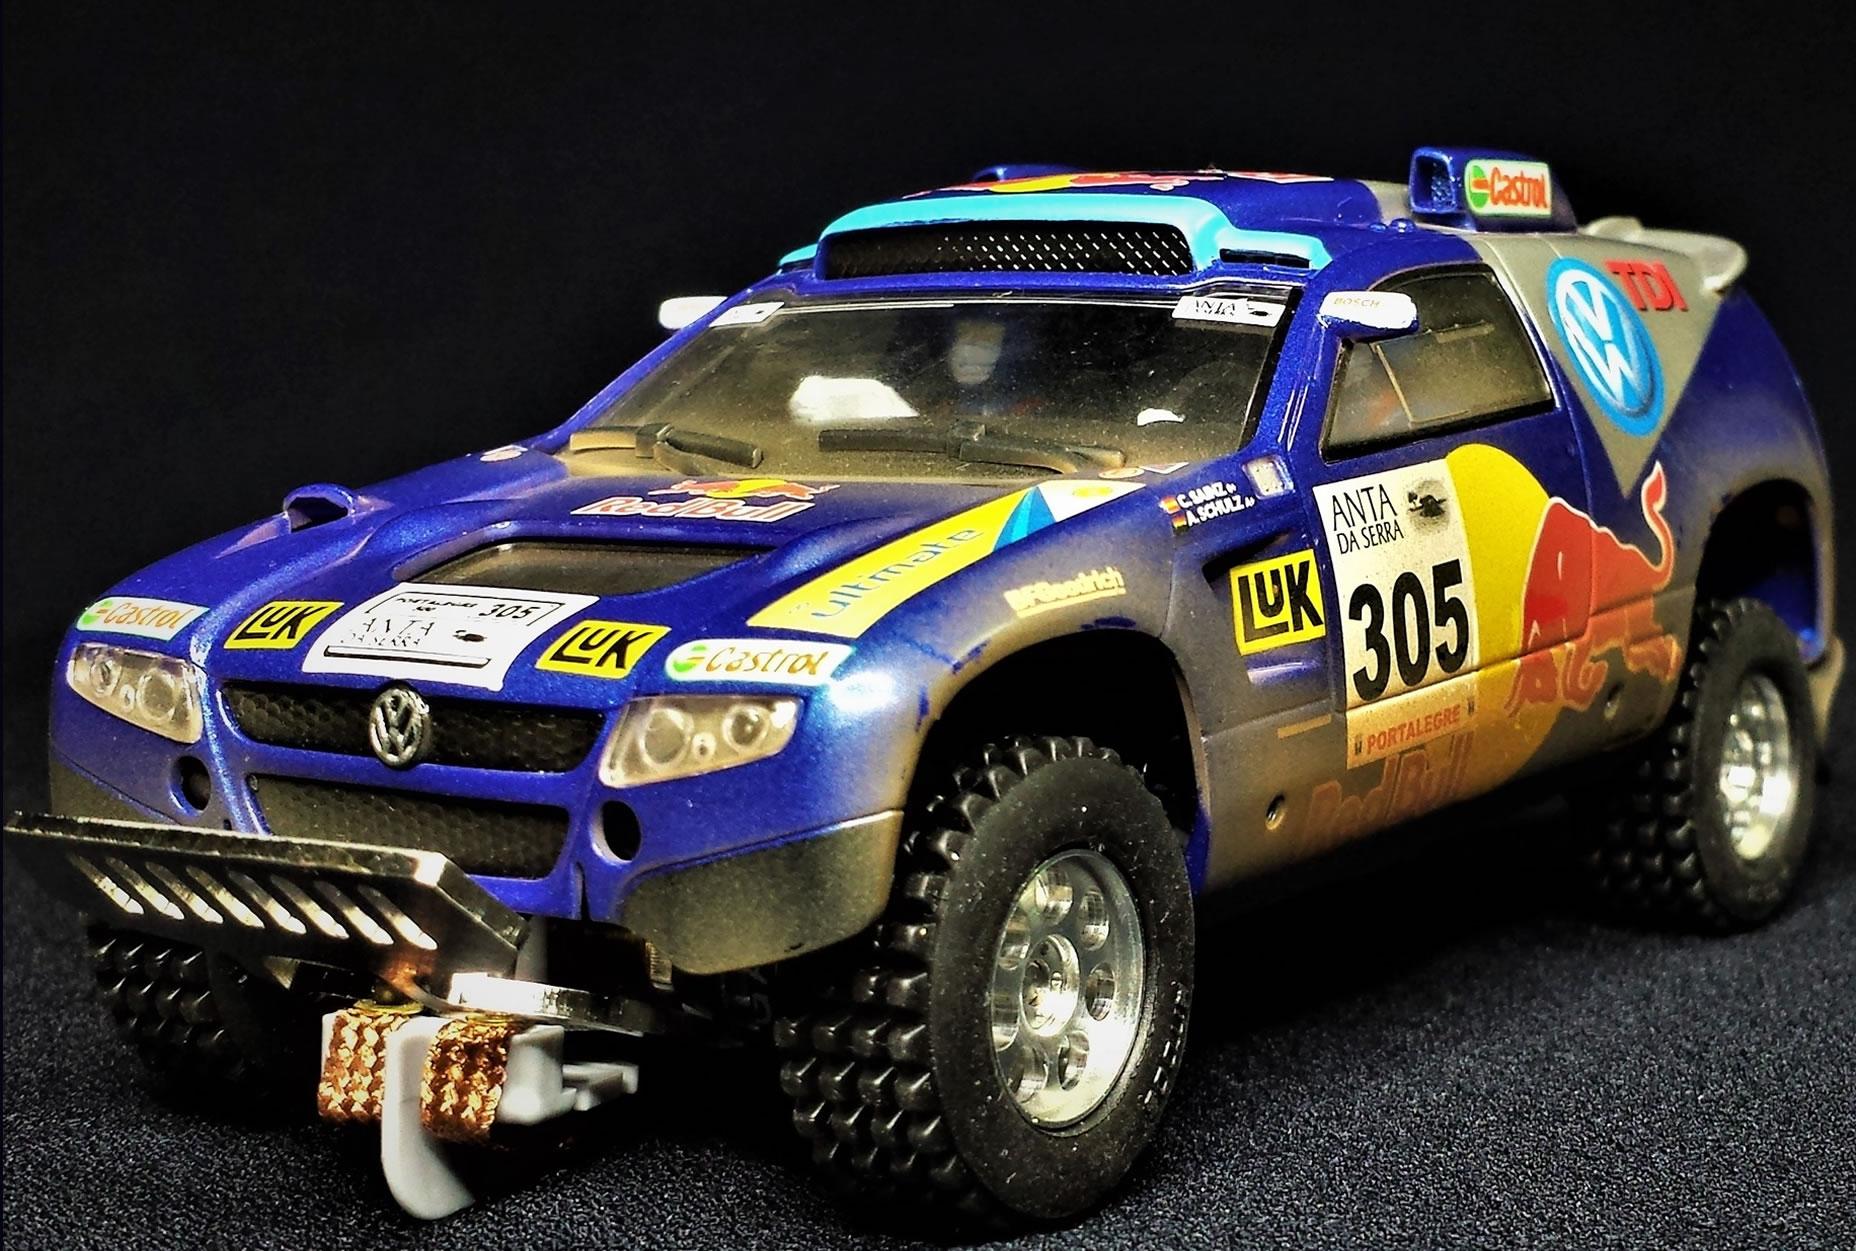 M803 - MITSUBISHI LANCER RACING – #304 – DAKAR 2009 – NANI ROMA